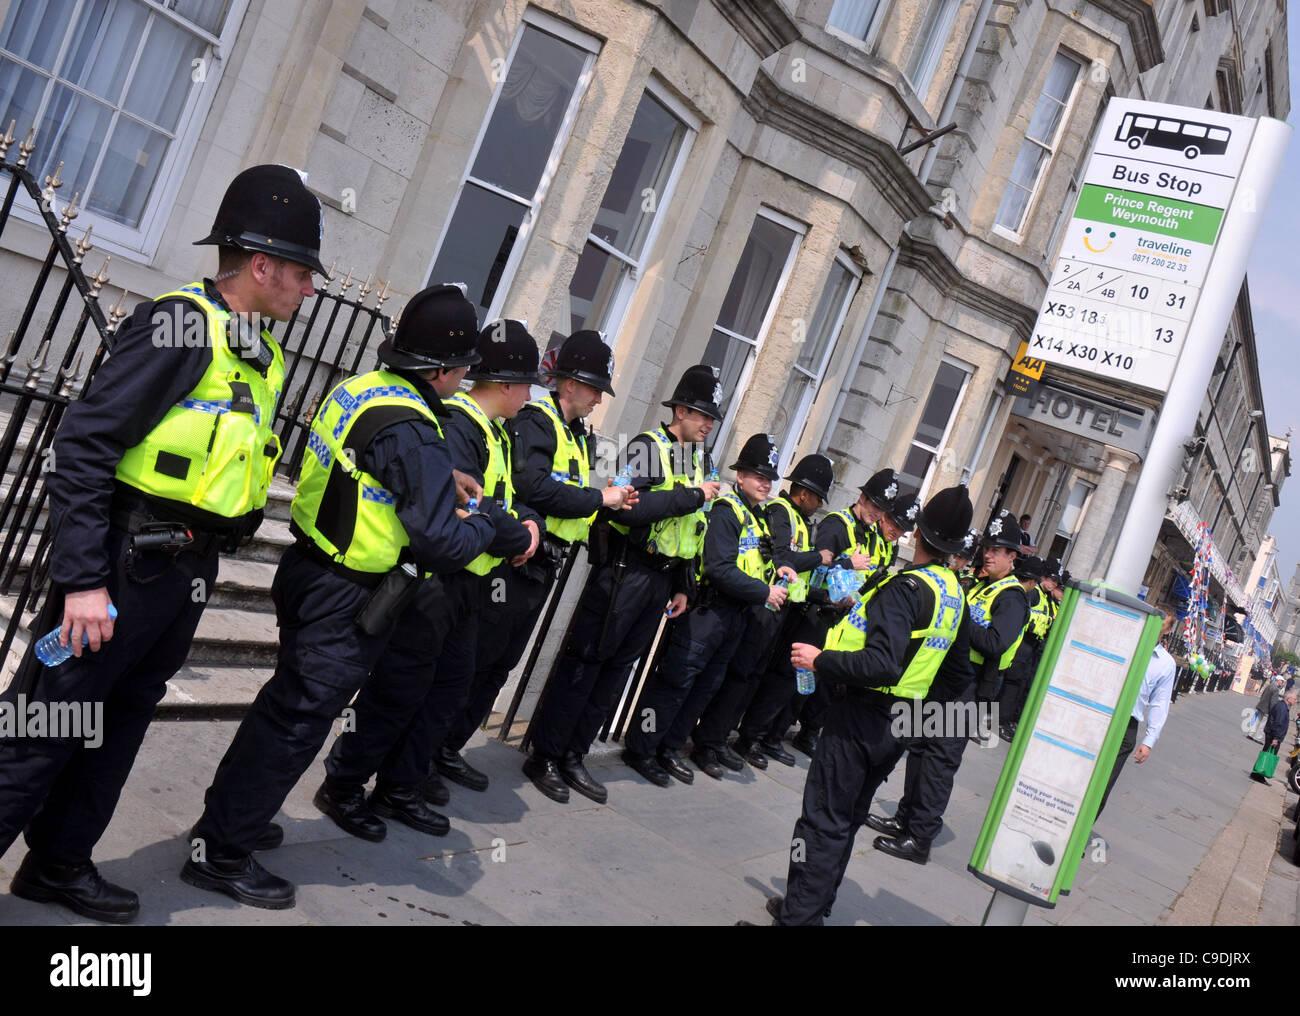 Policemen at a bus stop, Britain, UK - Stock Image